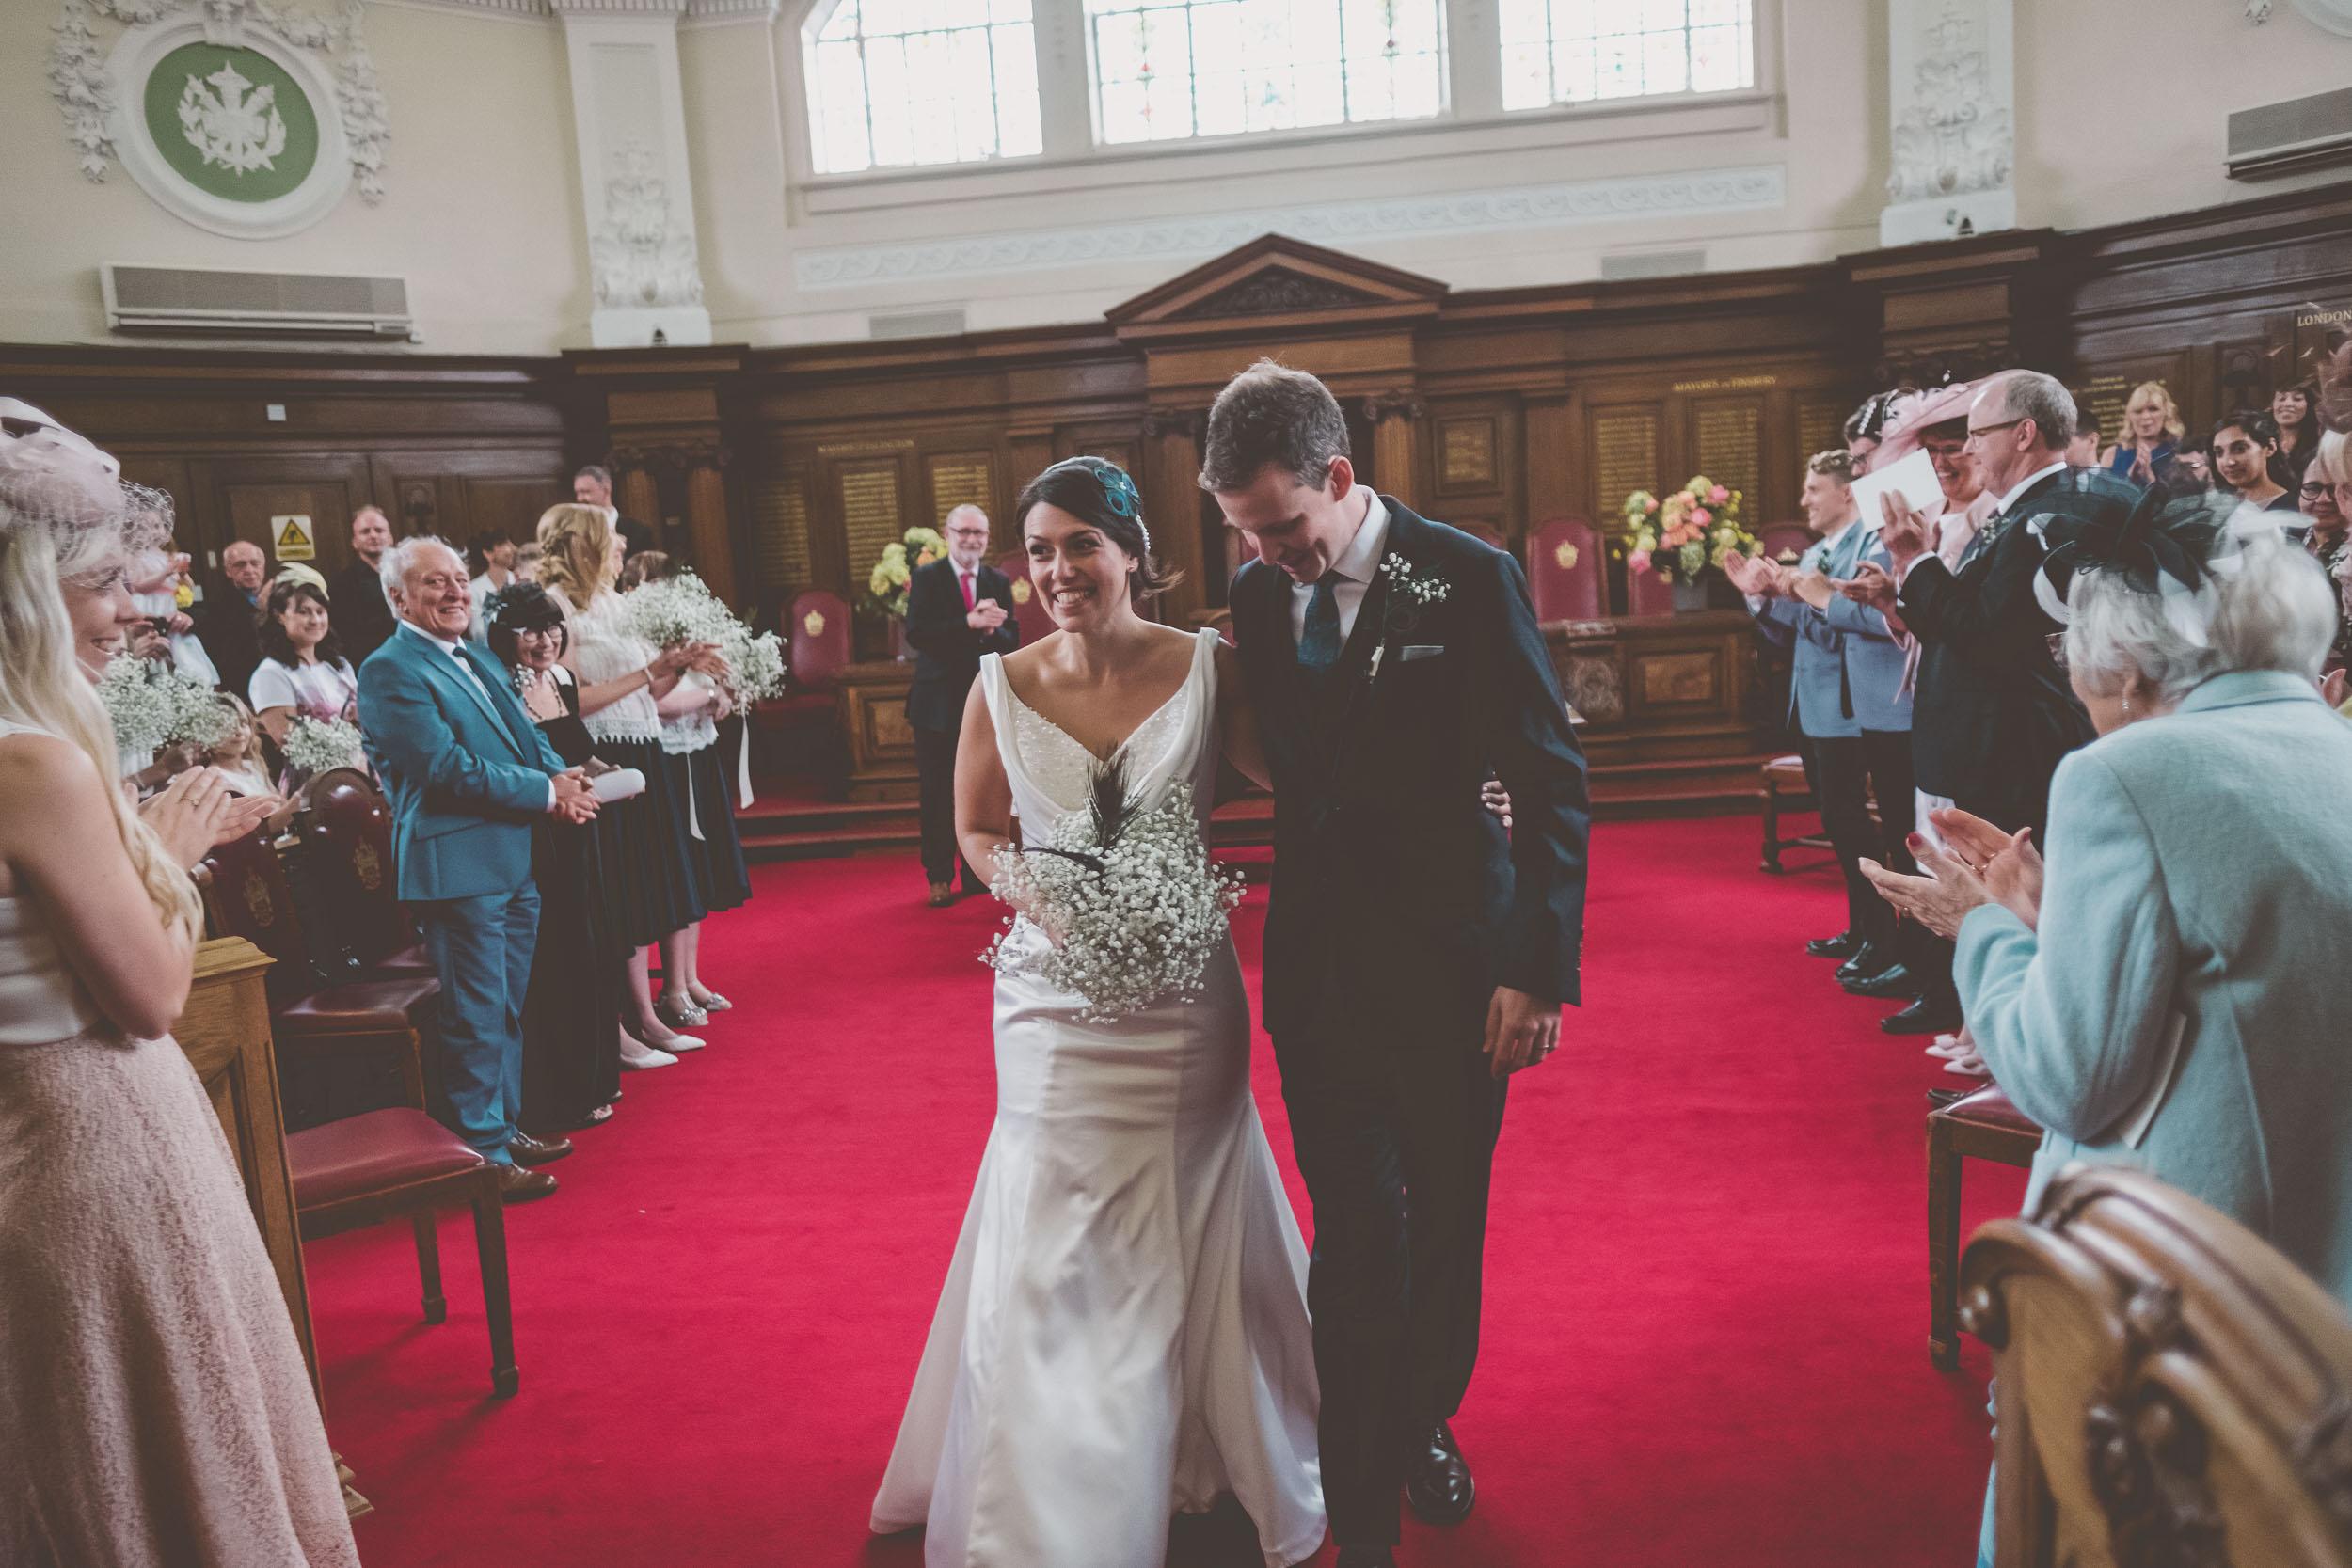 islington-town-hall-4th-floor-studios-wedding125.jpg